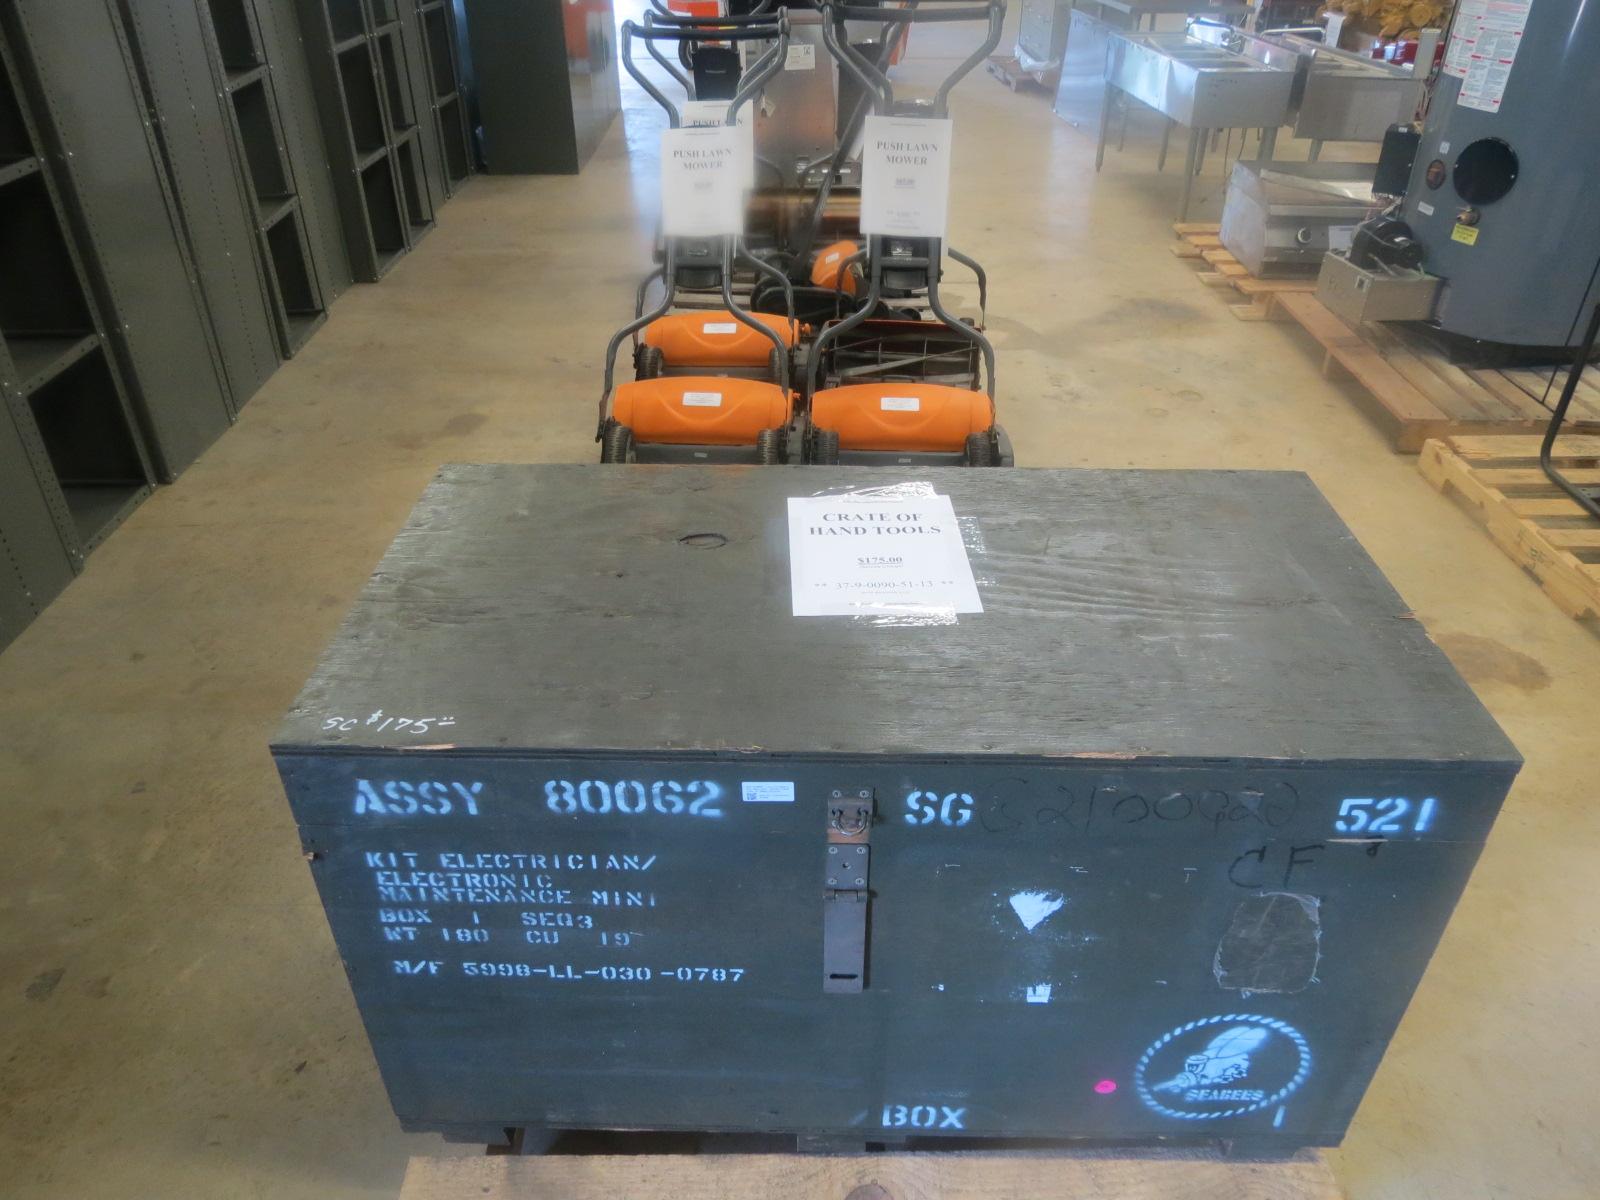 Tool Crate